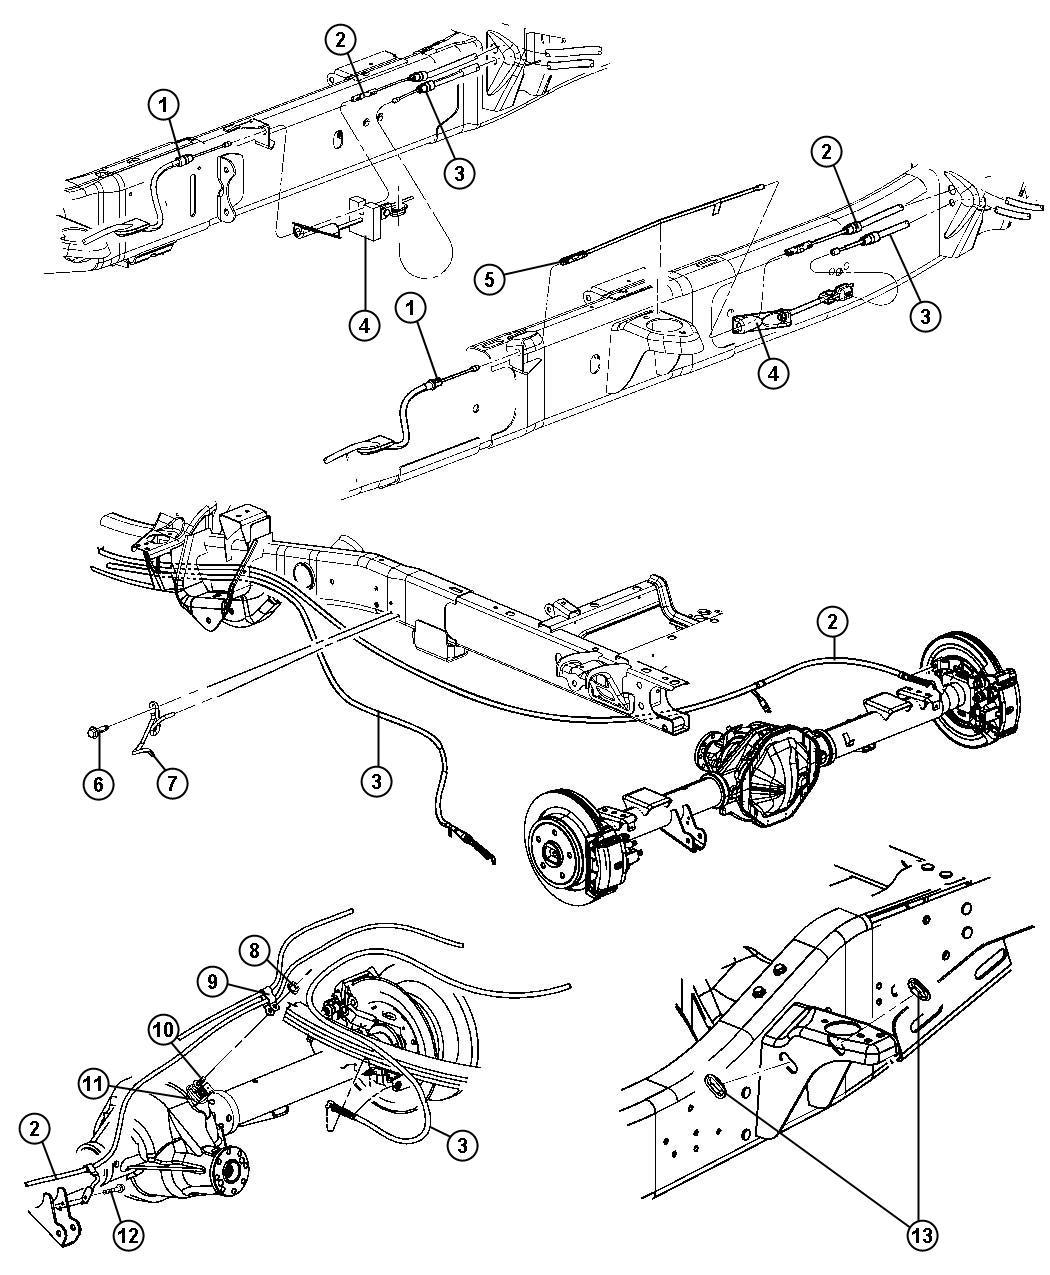 Dodge Brakes Diagram - Wiring Diagrams List